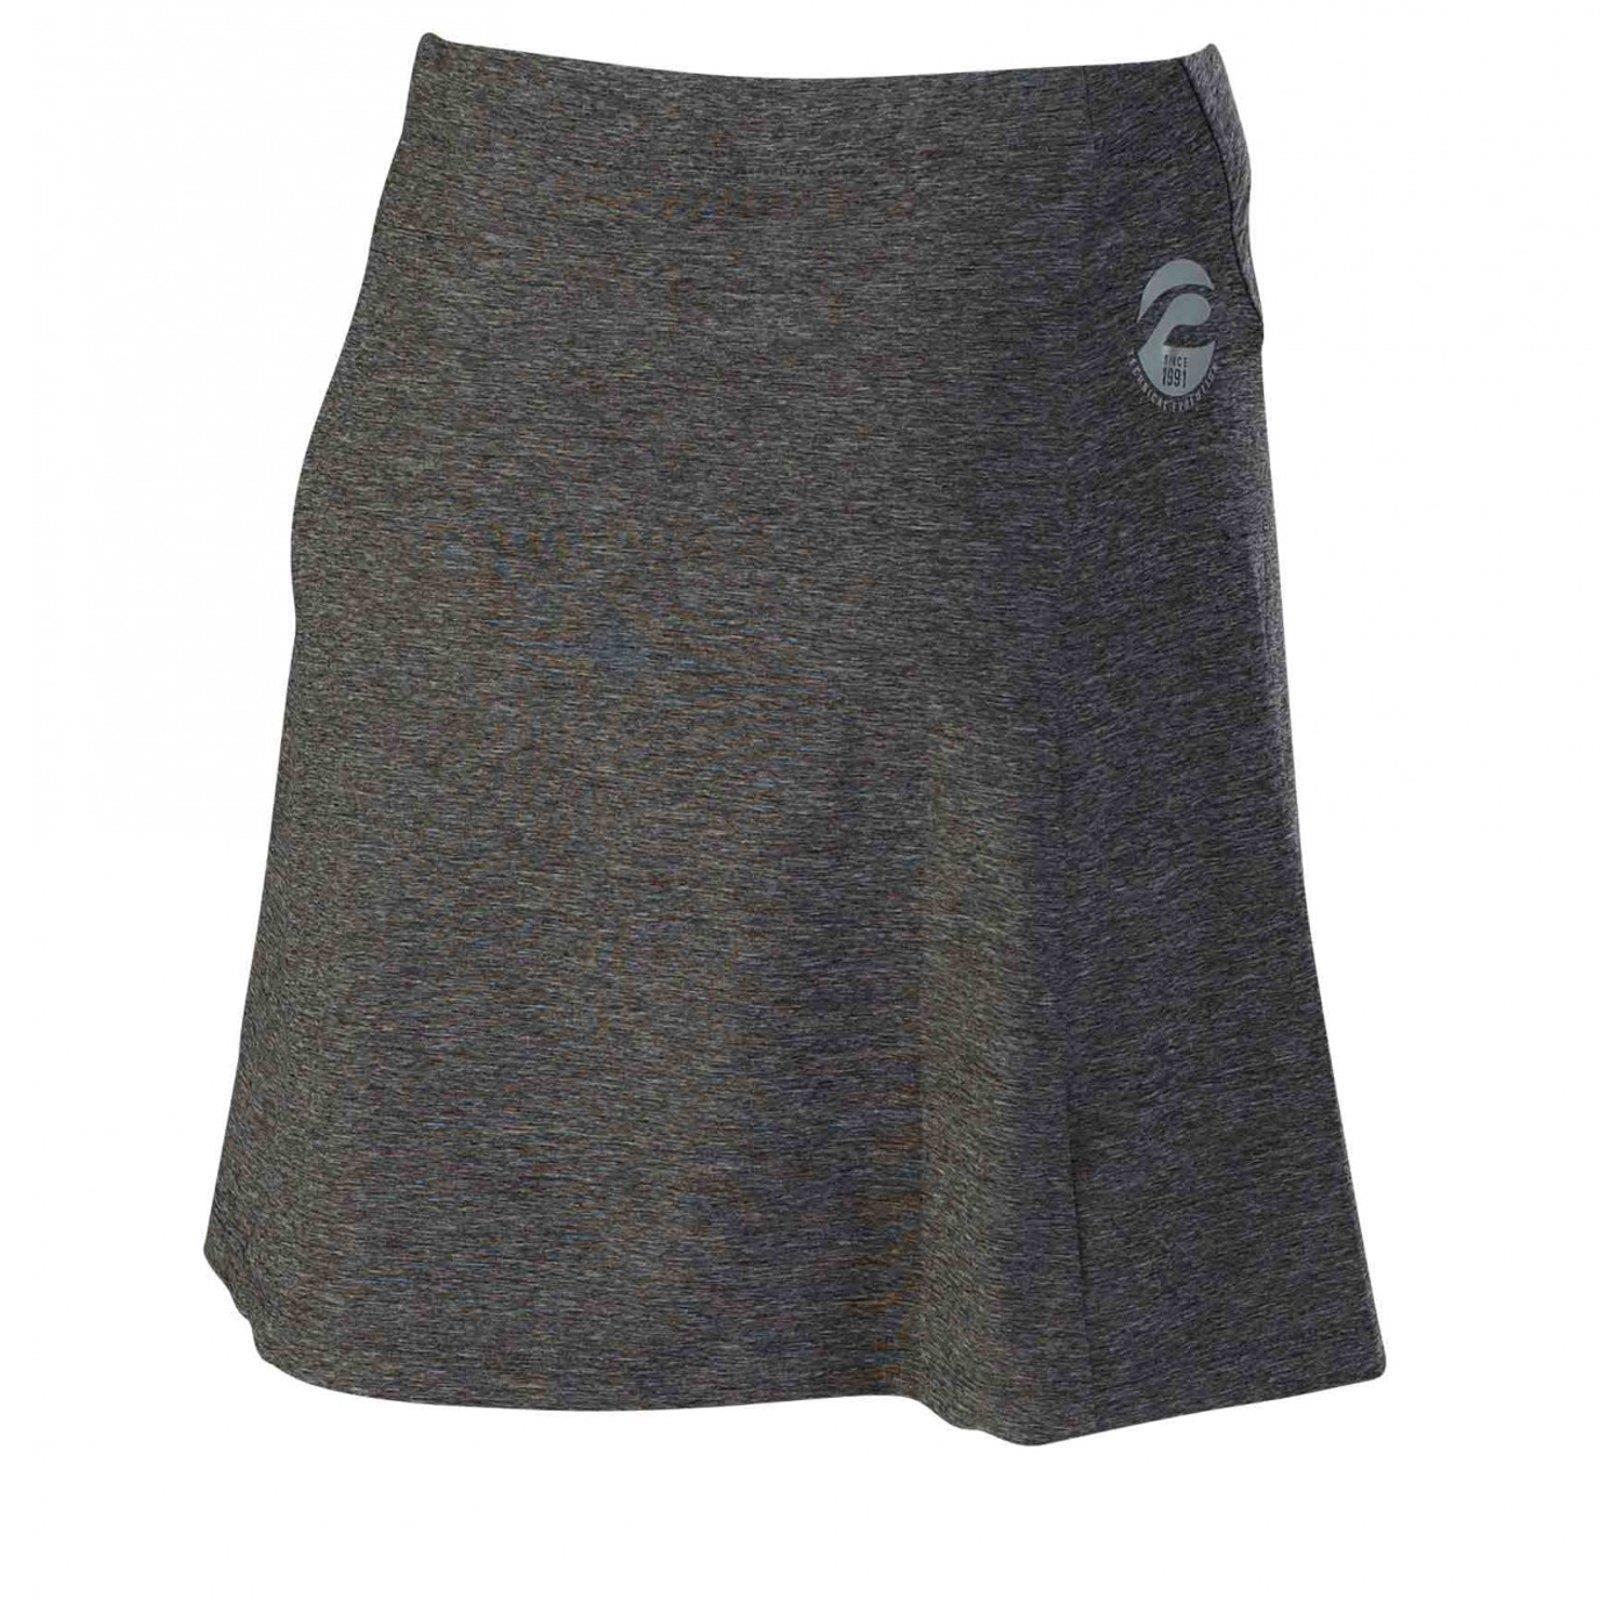 protective skirt jade rock short damen fahrrad innenhose trekking atmungsaktiv ebay. Black Bedroom Furniture Sets. Home Design Ideas